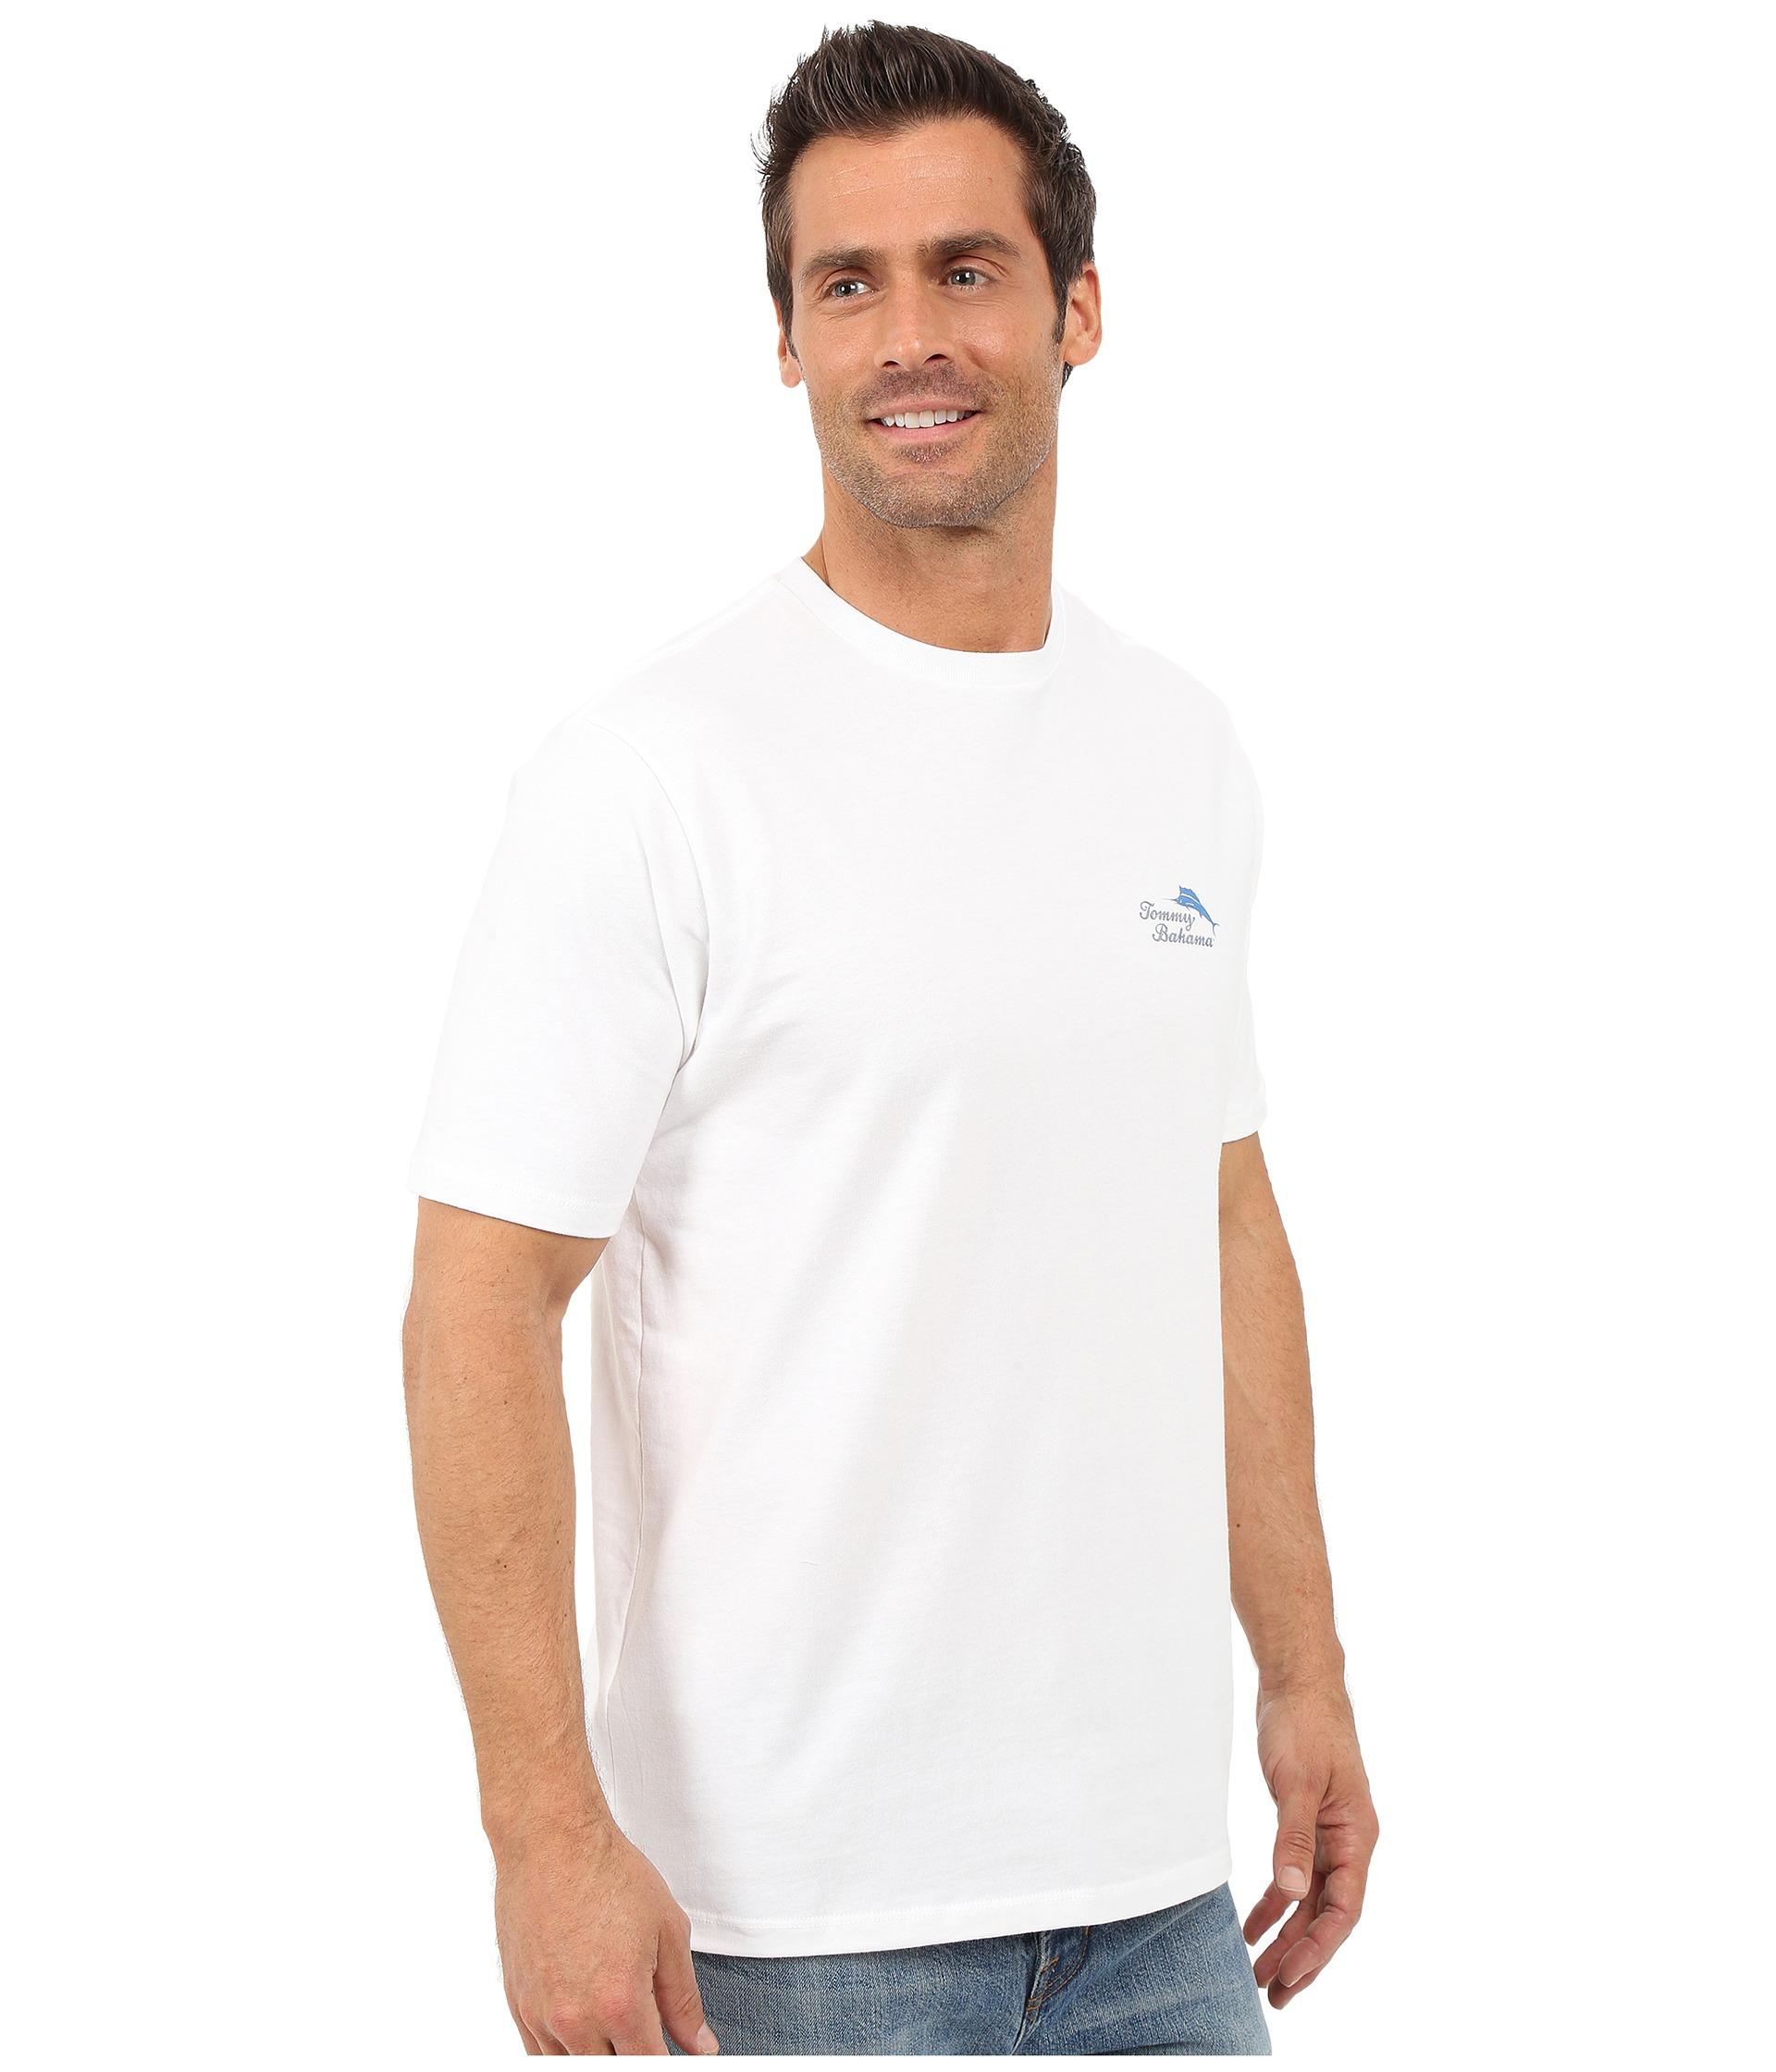 Tommy bahama tee party t shirt white free for Custom tommy bahama shirts